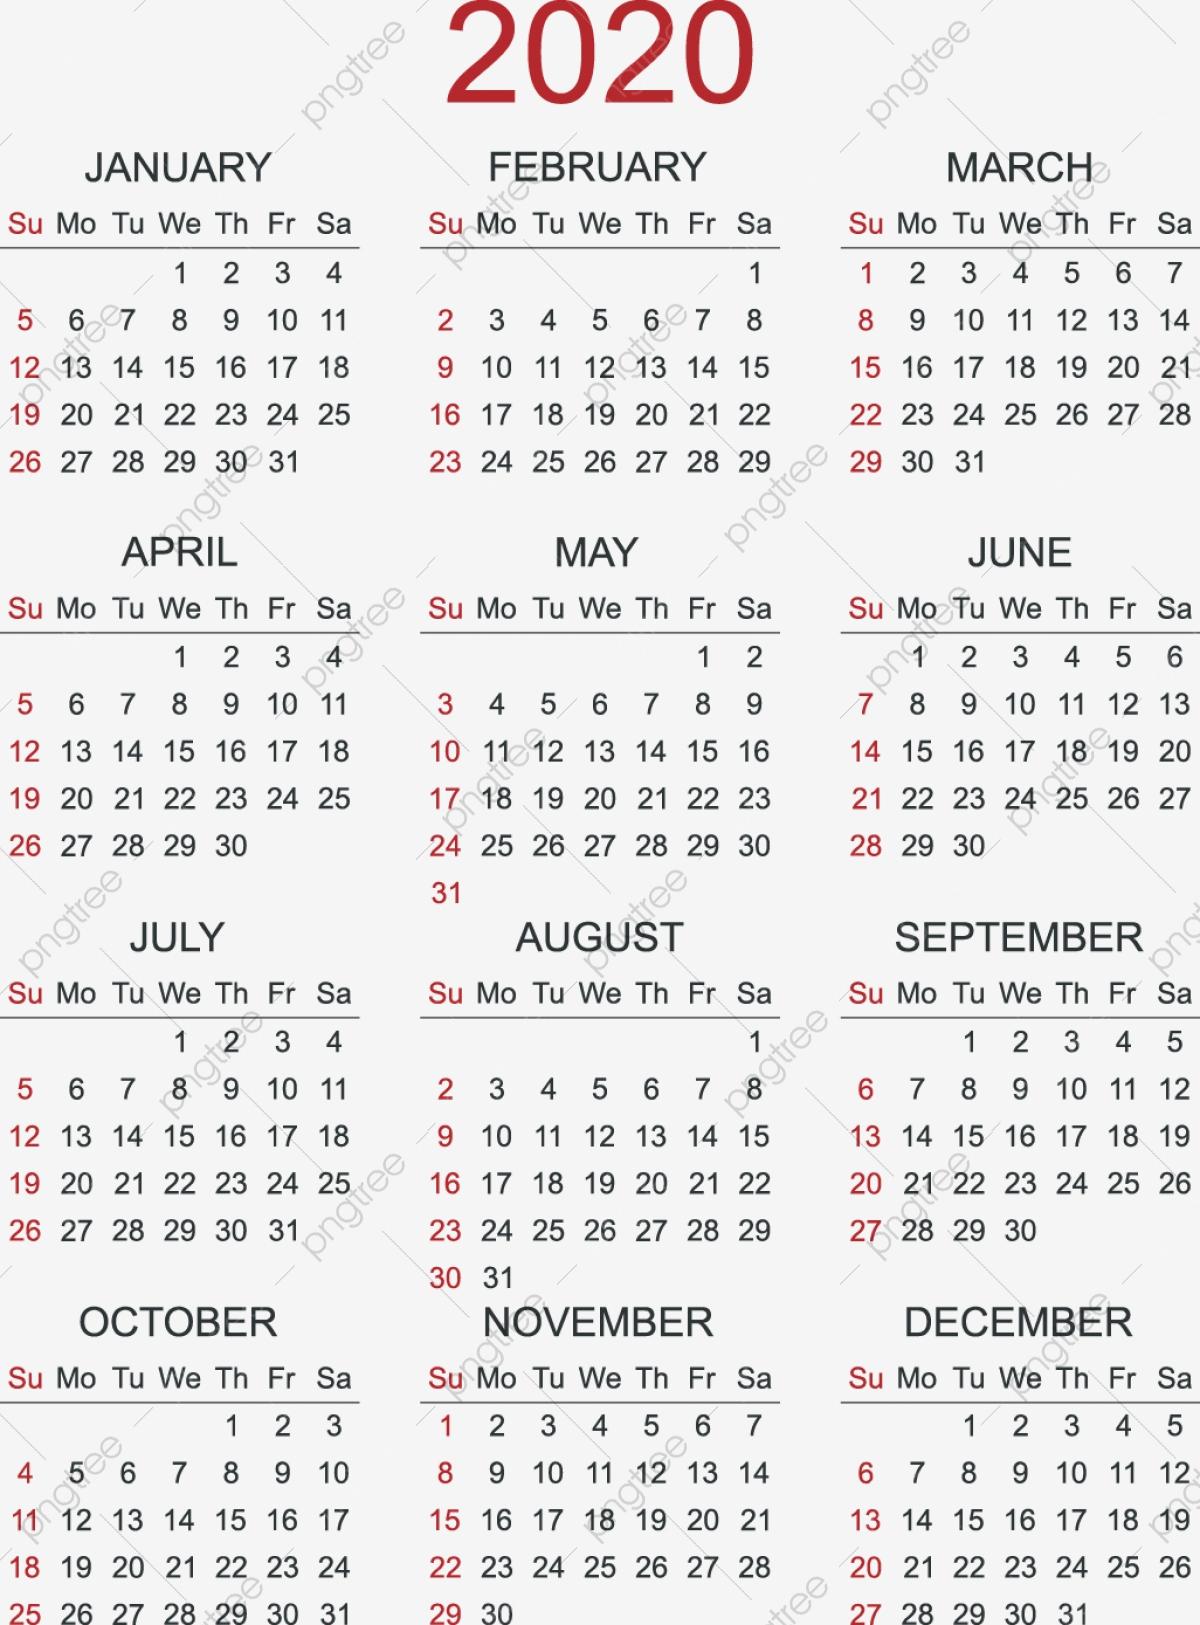 2020 Calendar Calendar 2020 Calendar Calendar 2020 Calendar